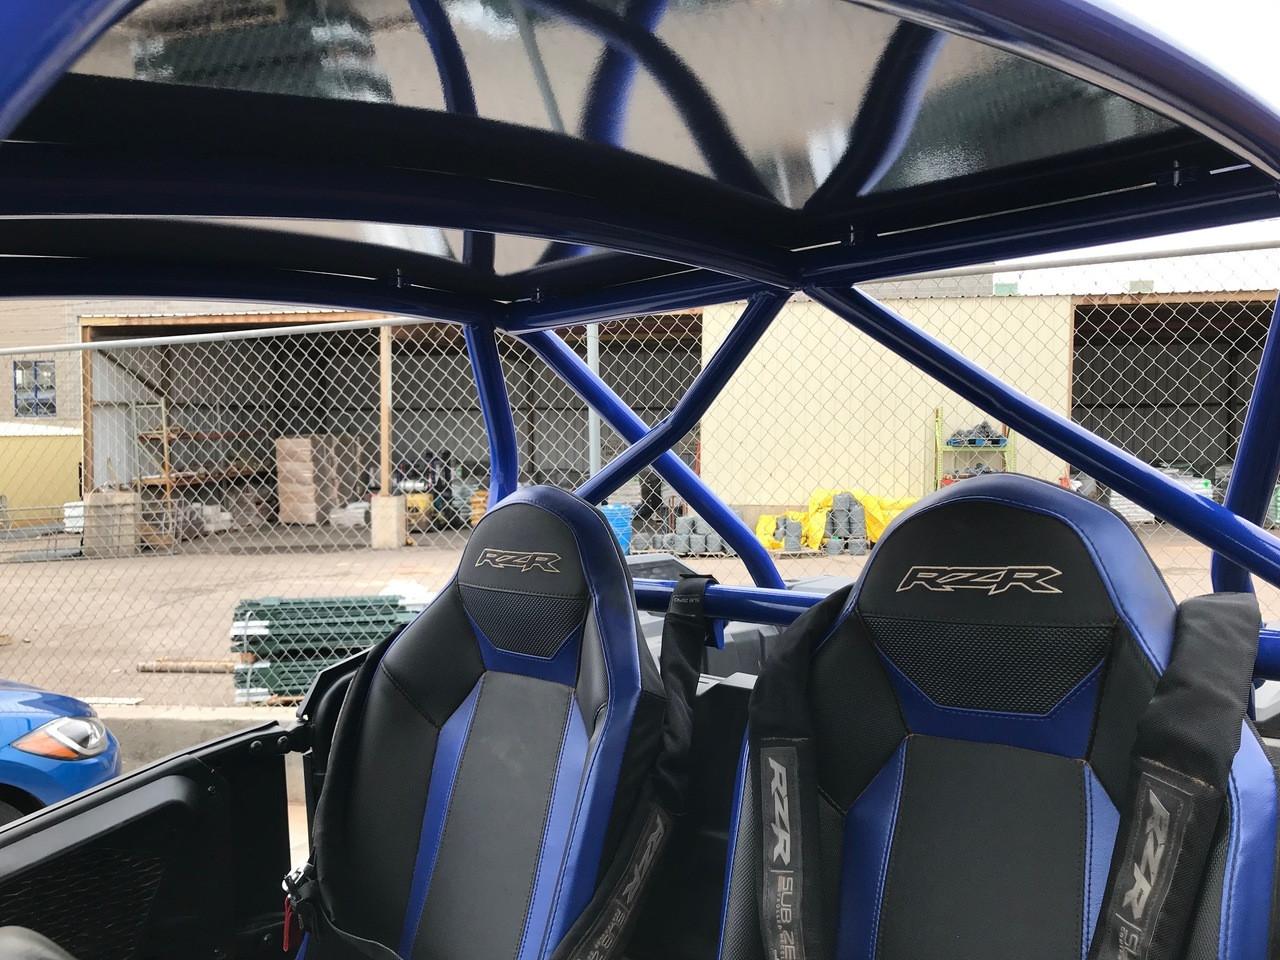 XFR Reaper Short Cage Polaris RZR XP Turbo S